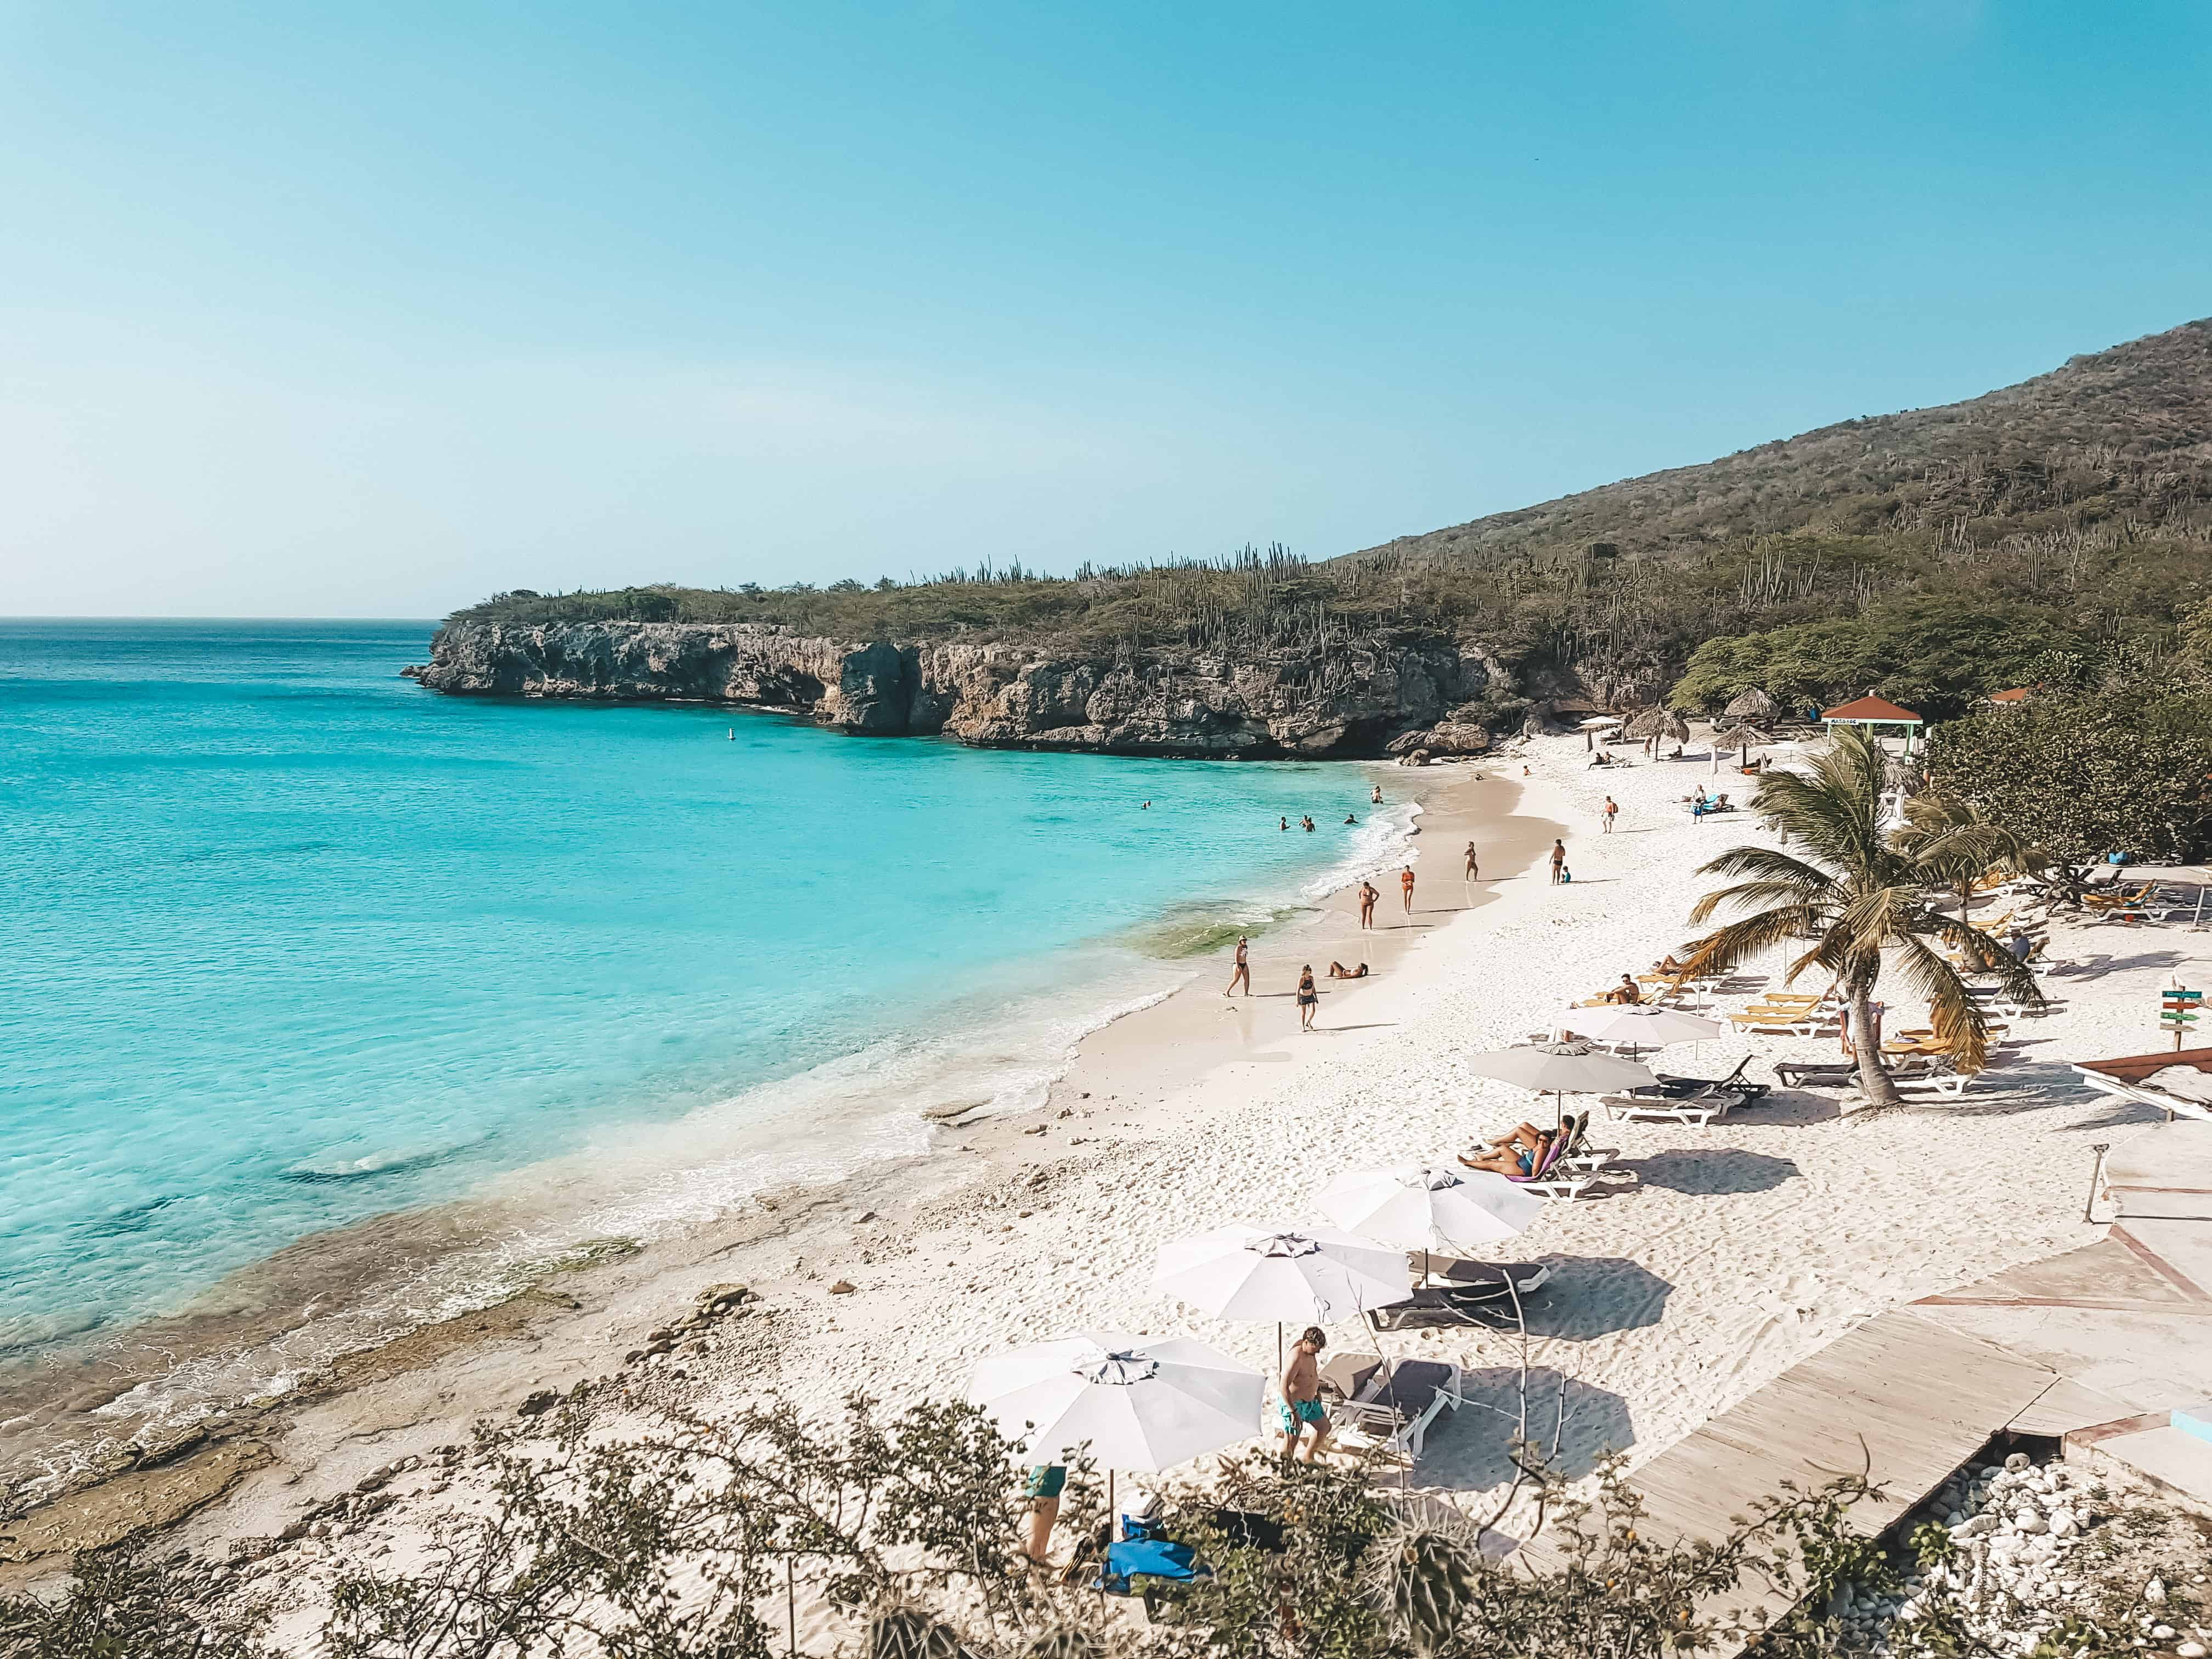 Explore Curacao